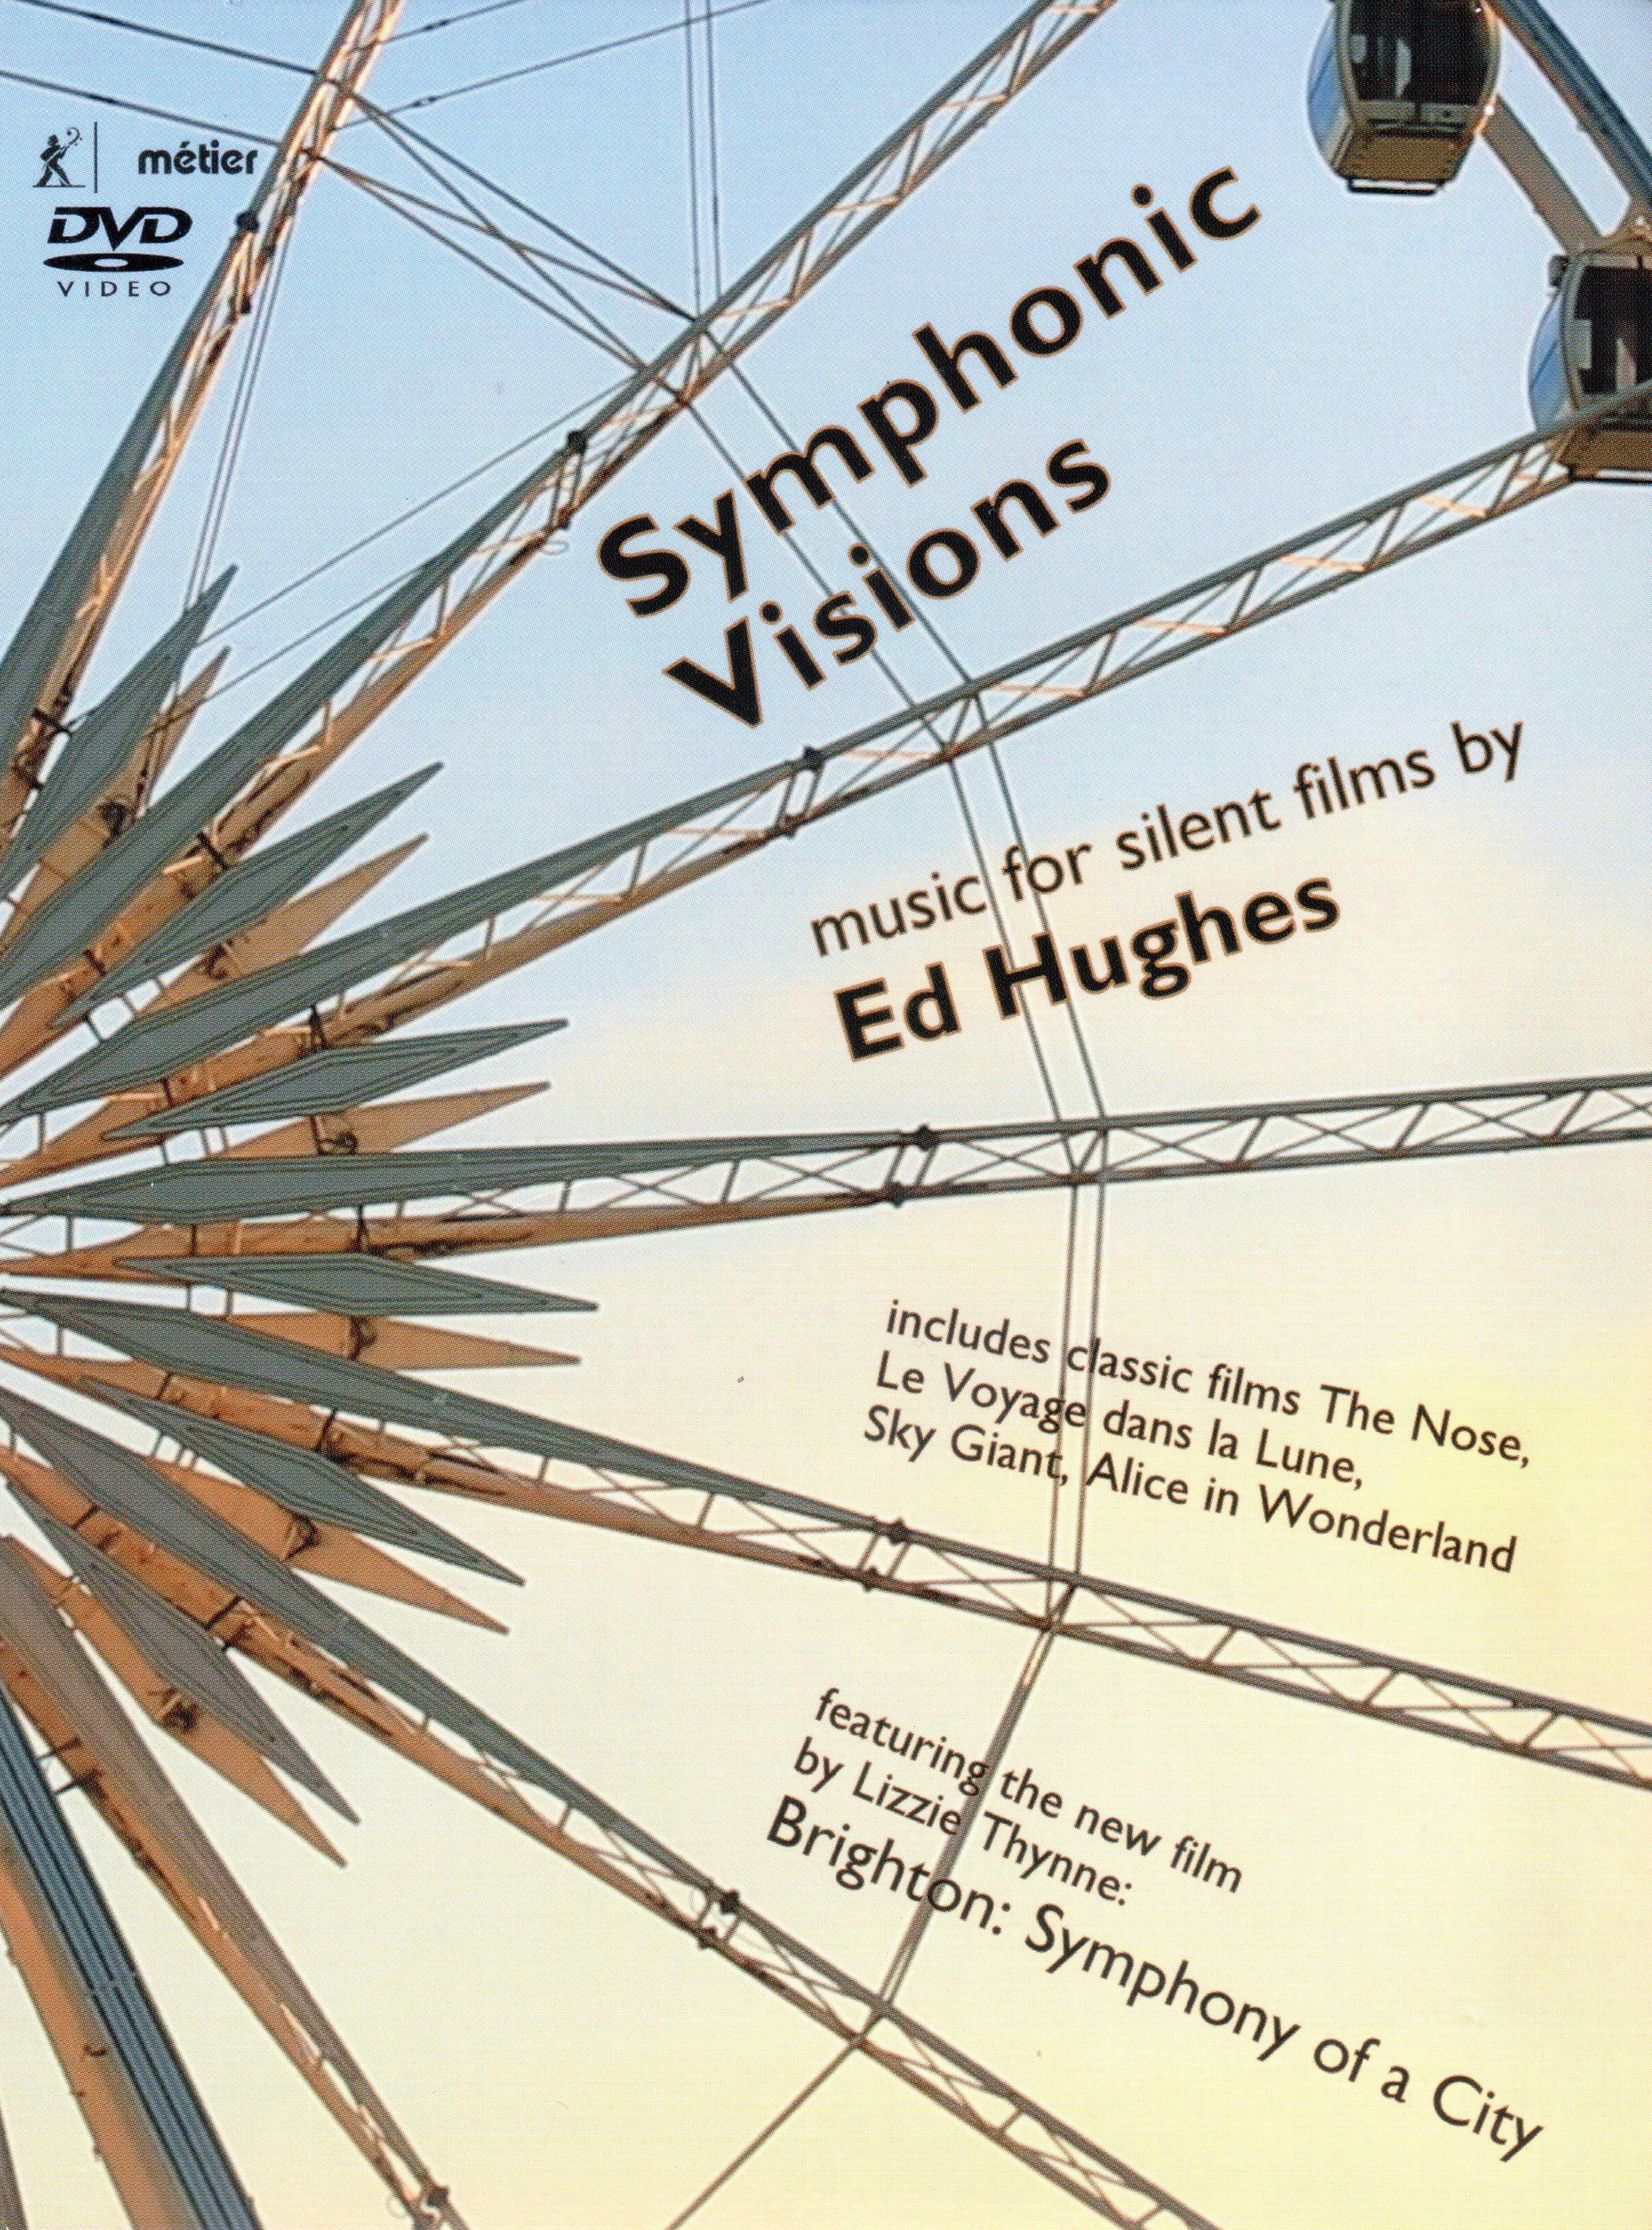 Ed-Hughes-Music 7.jpg